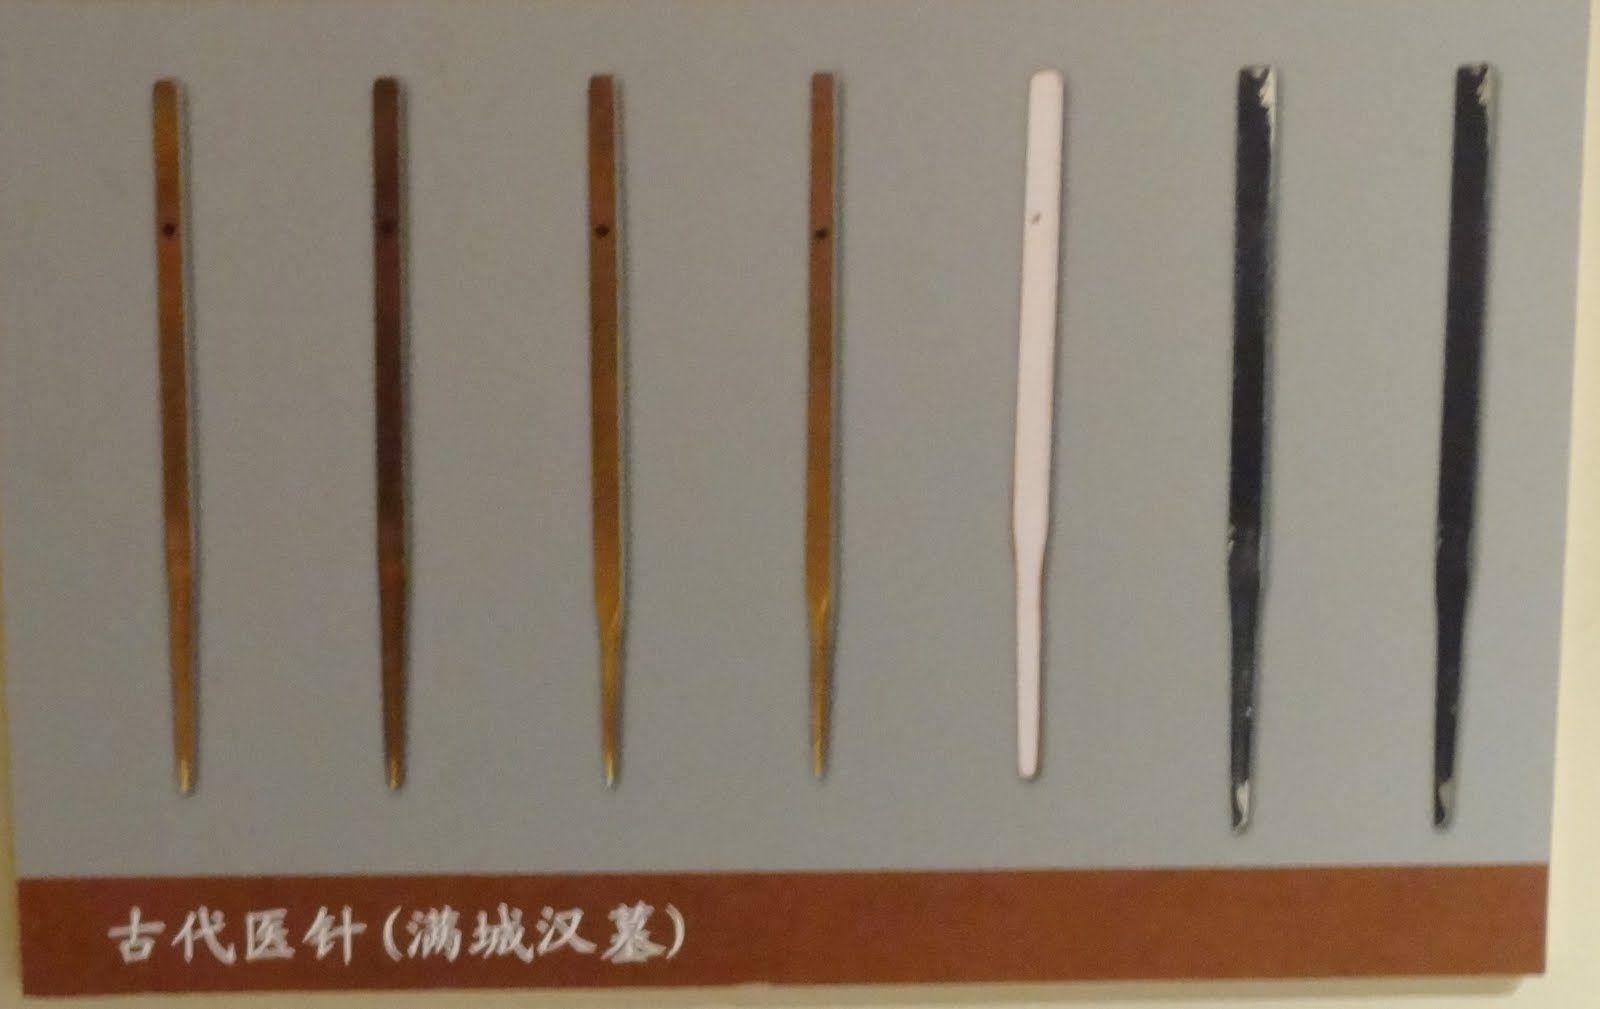 Ancient Acupuncture Needles Acupuncture Needles Acupuncture Ancient